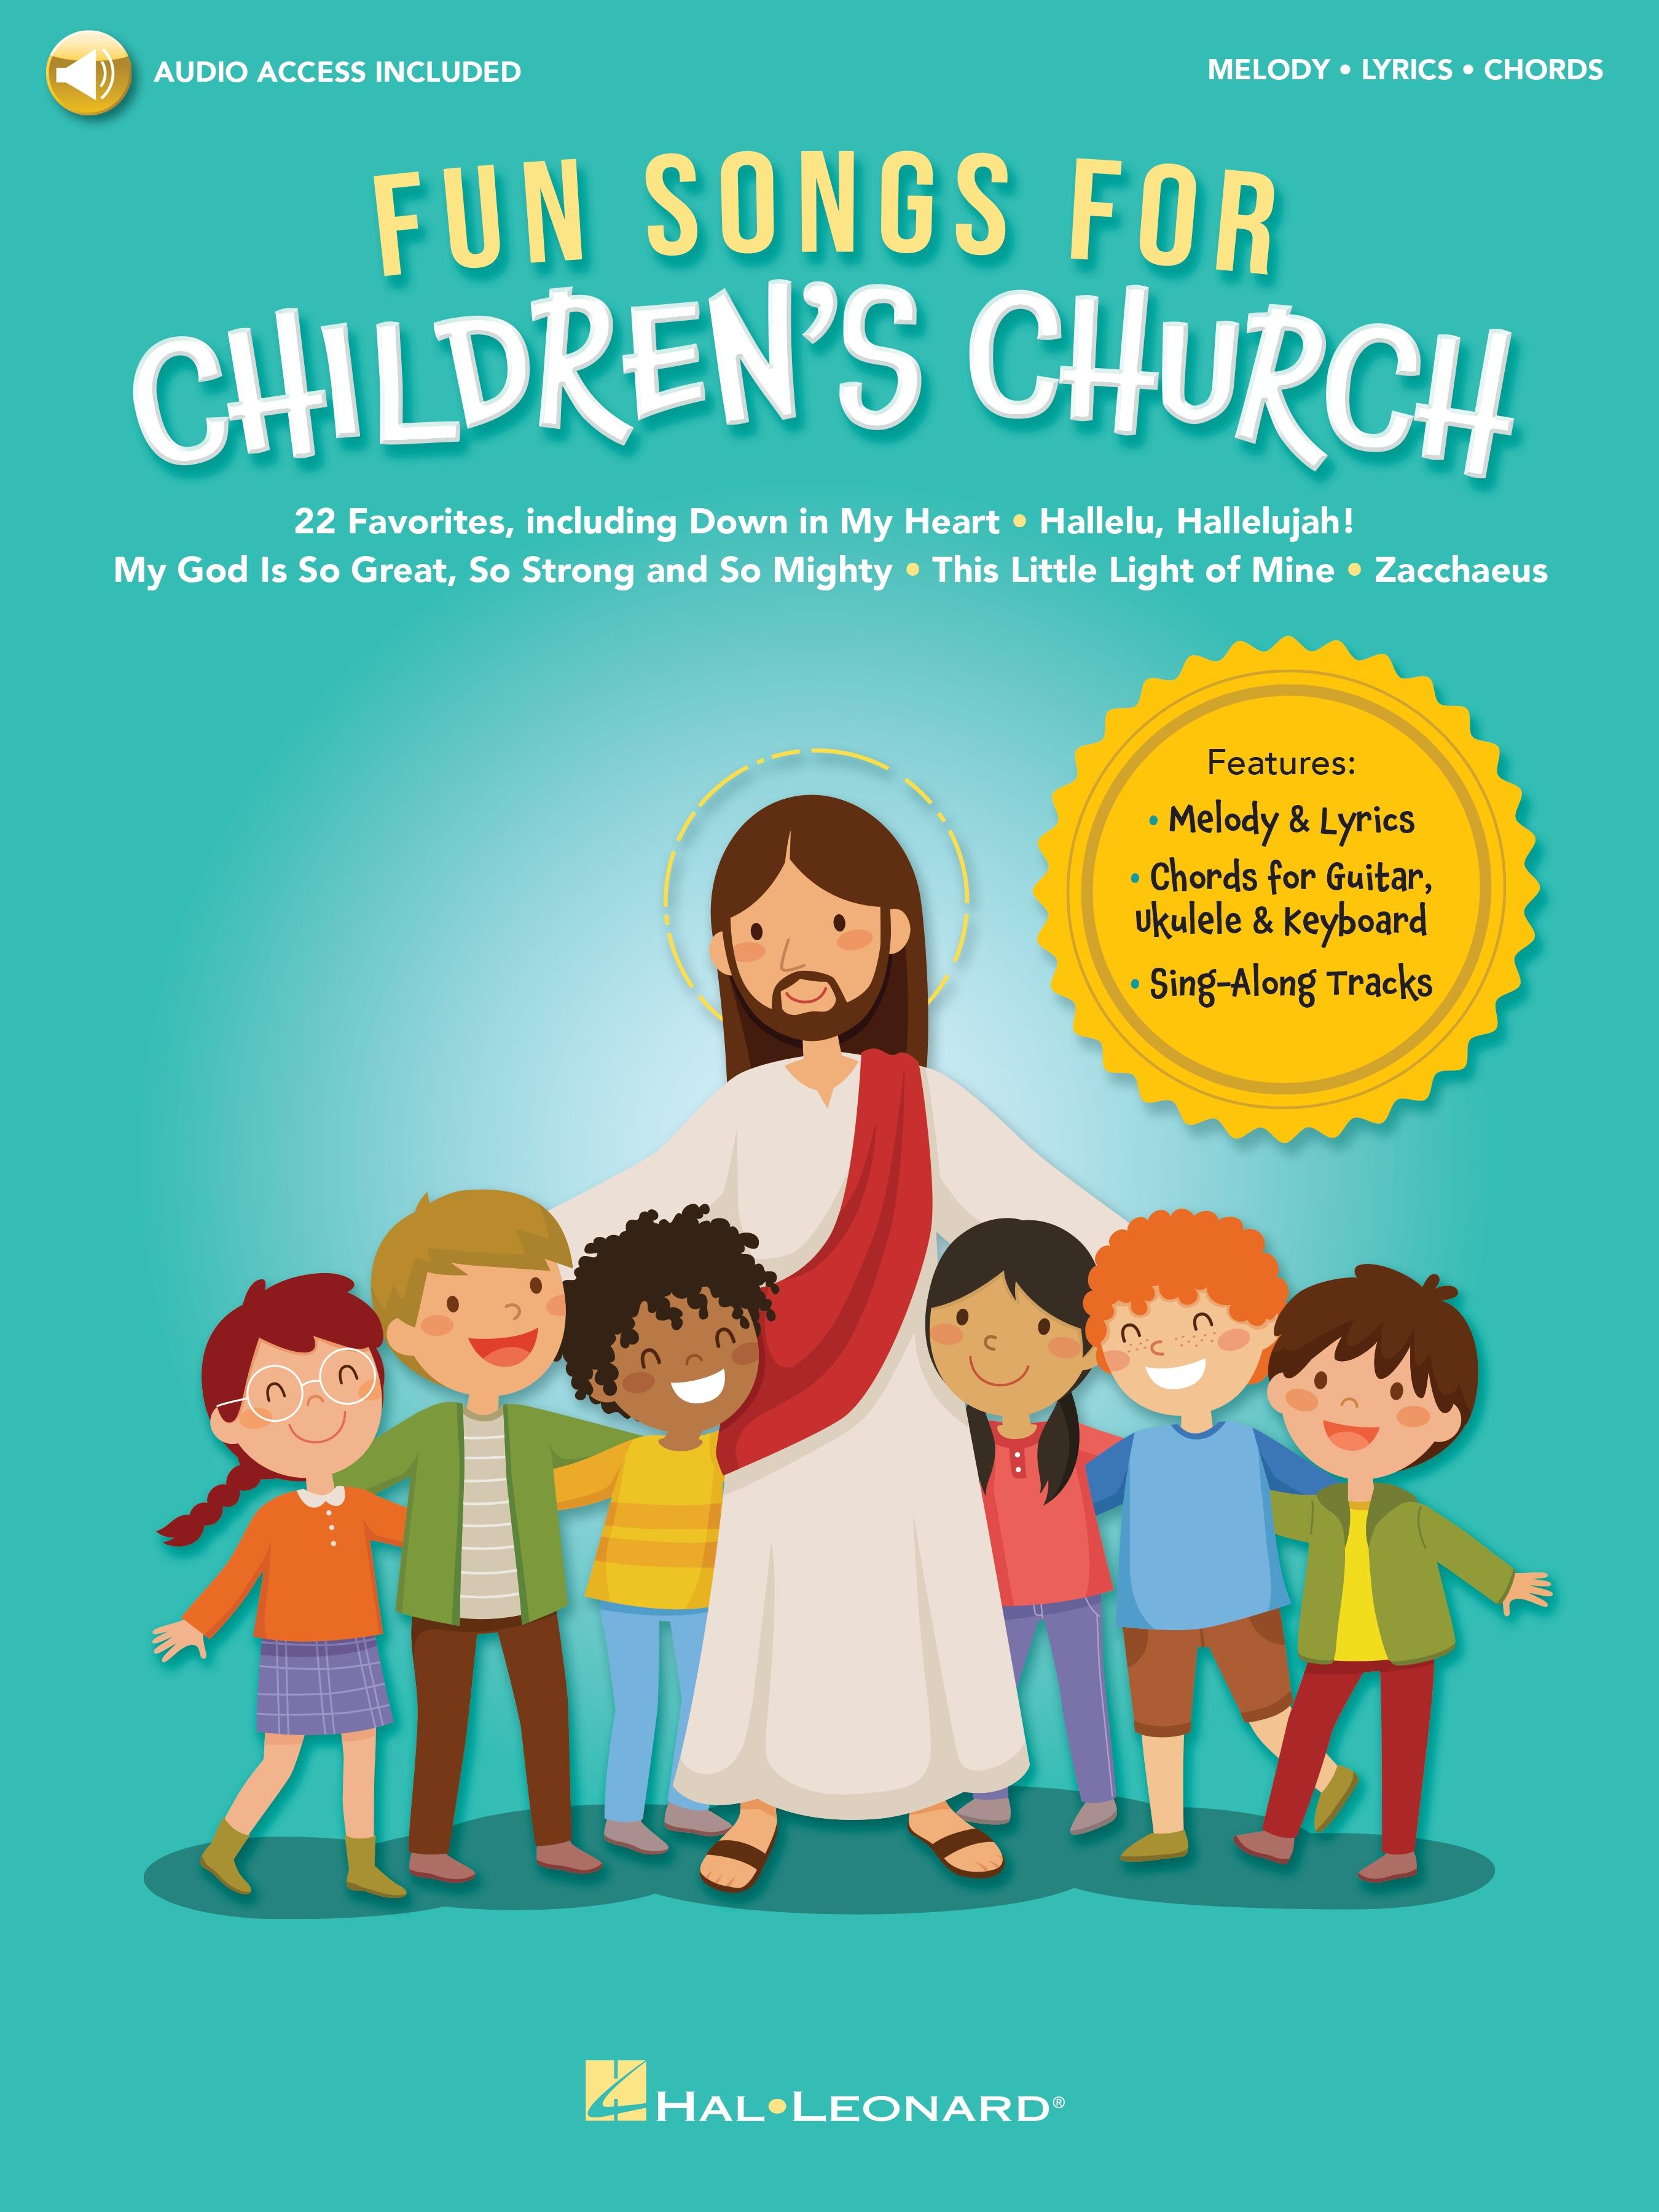 Fun Songs for Children's Church